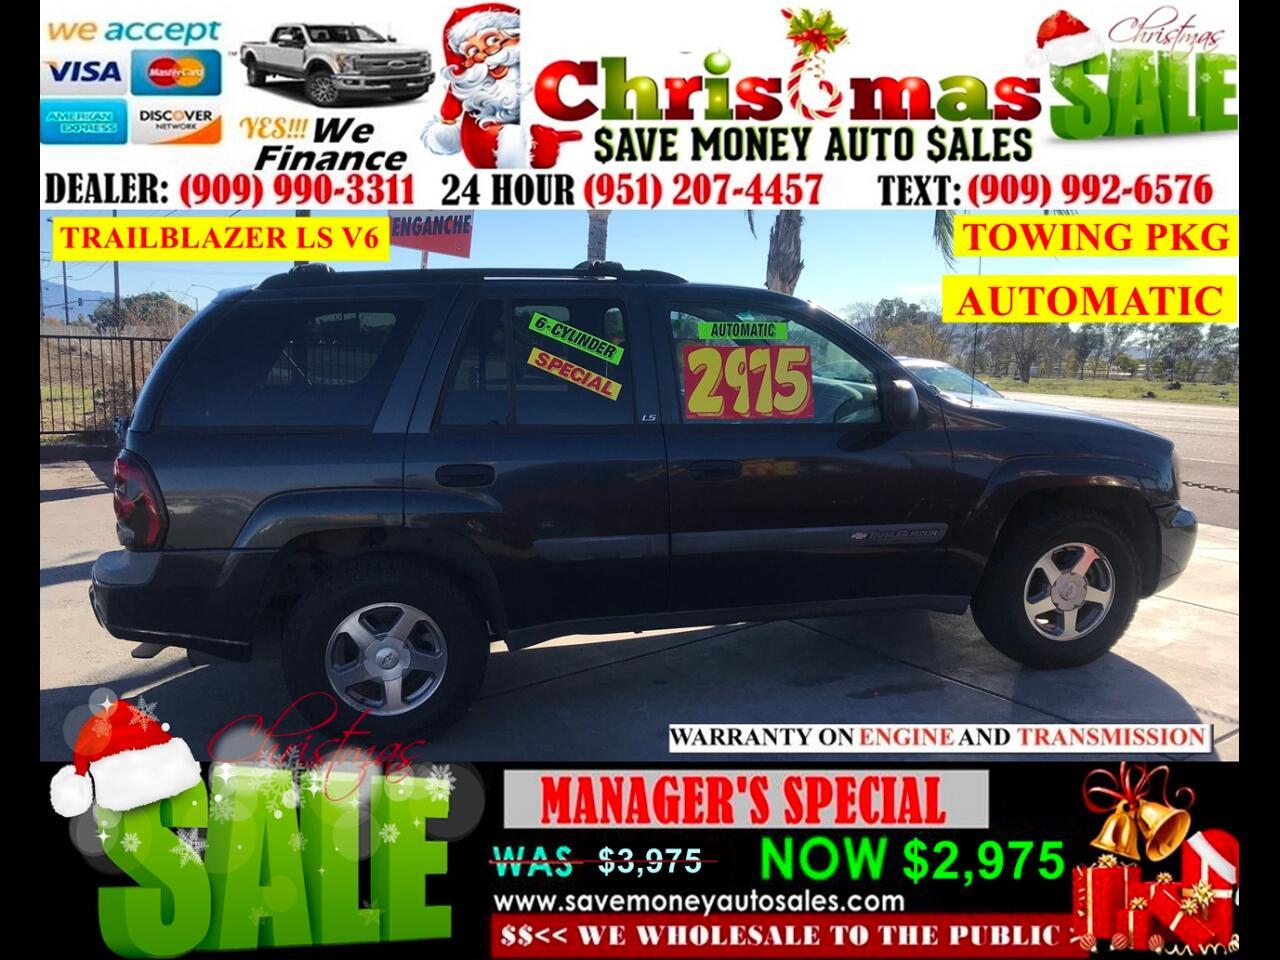 2004 Chevrolet TrailBlazer LS 2WD > TOWING PKG > SUPER CLEAN